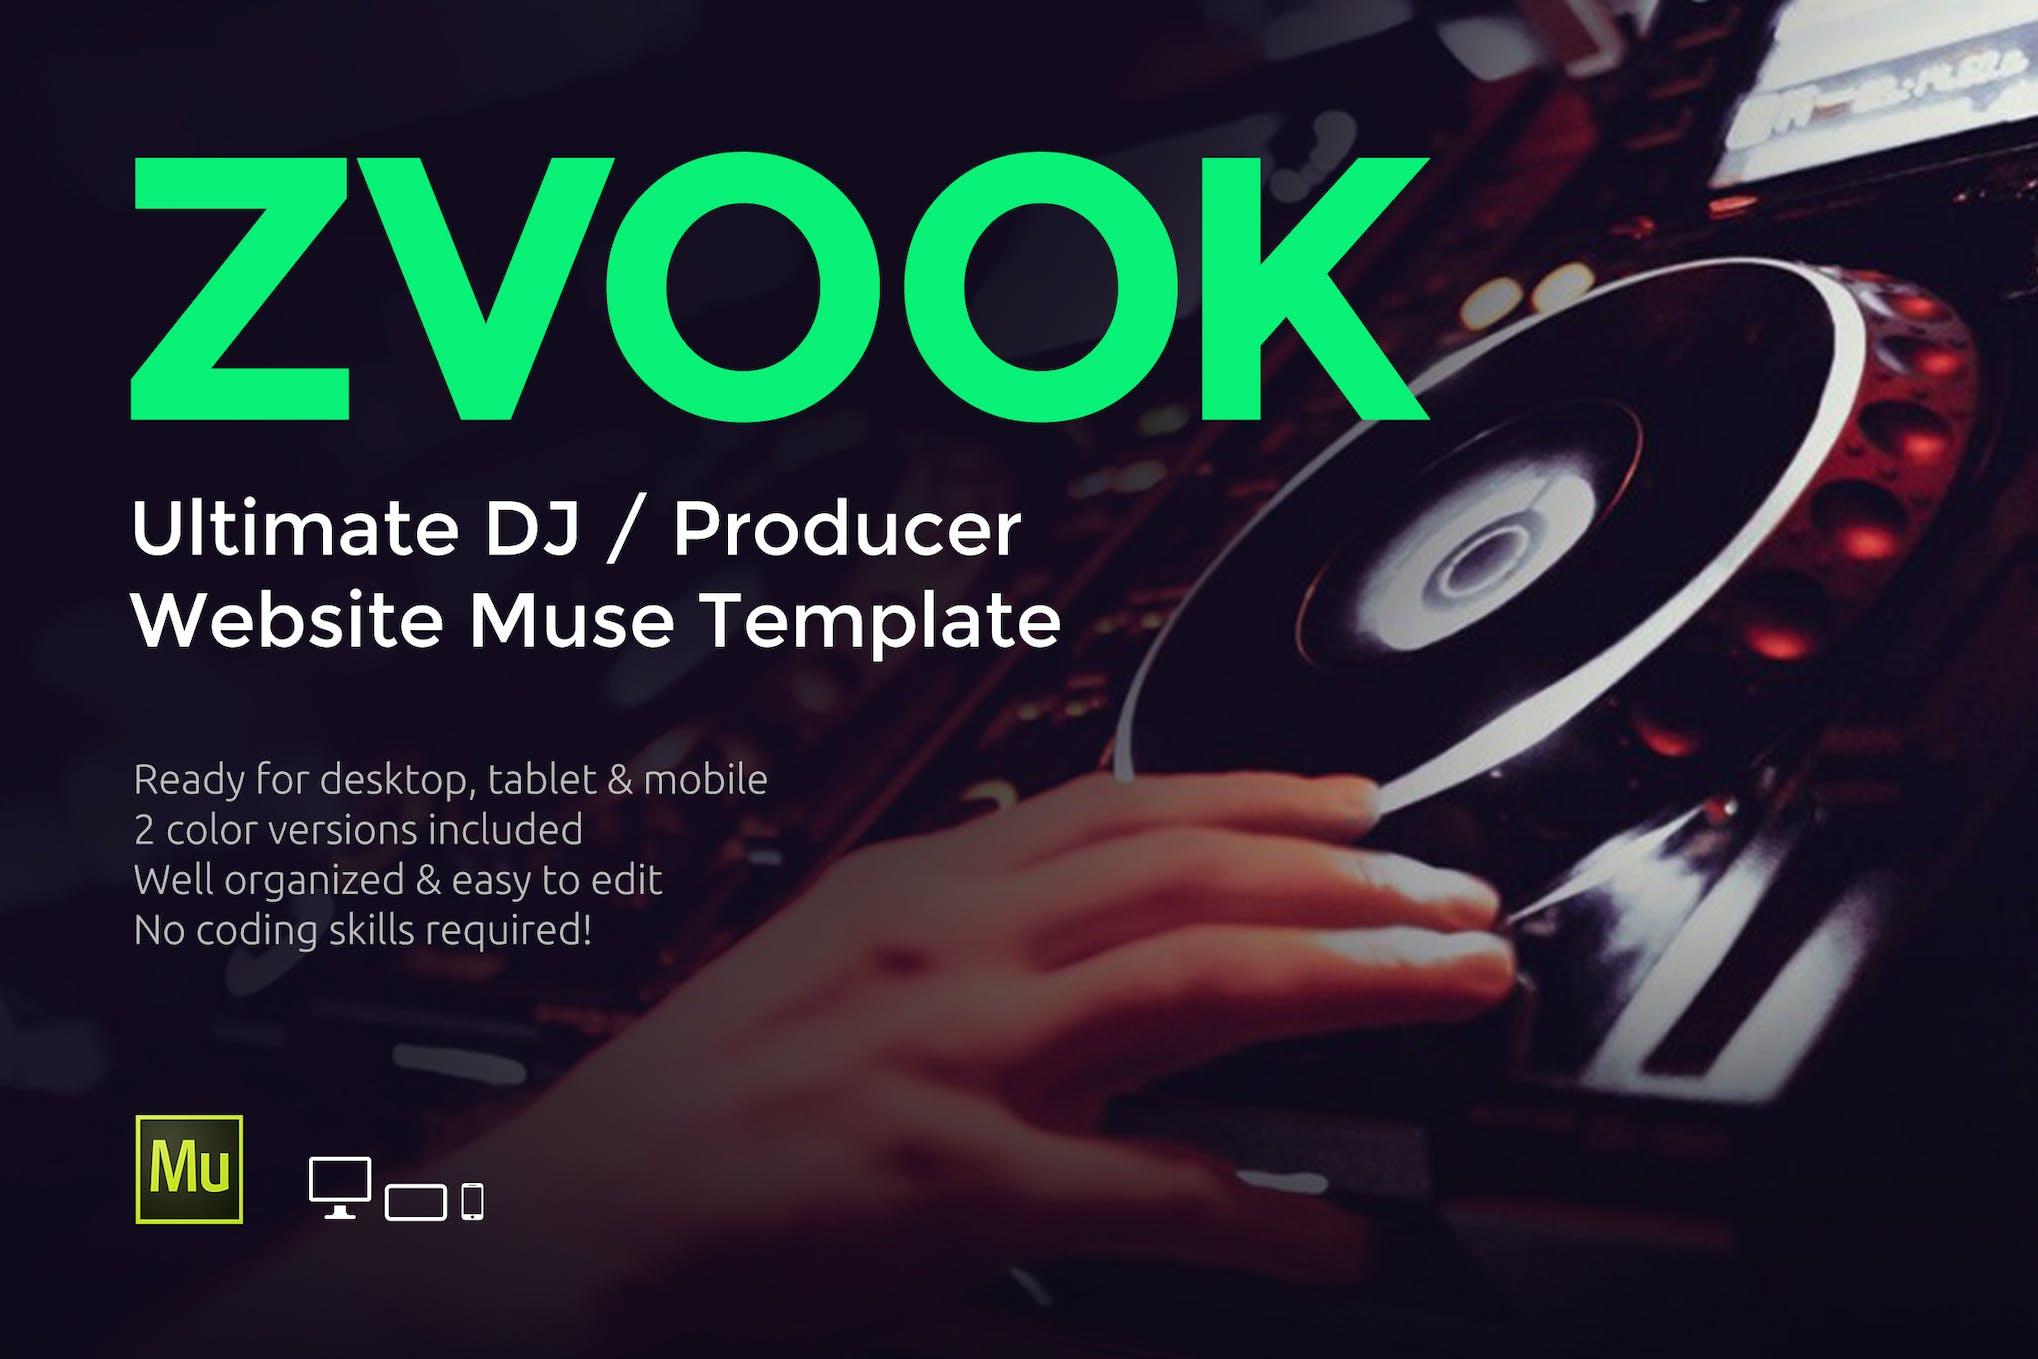 Zvook - DJ / Producer Website Muse Template